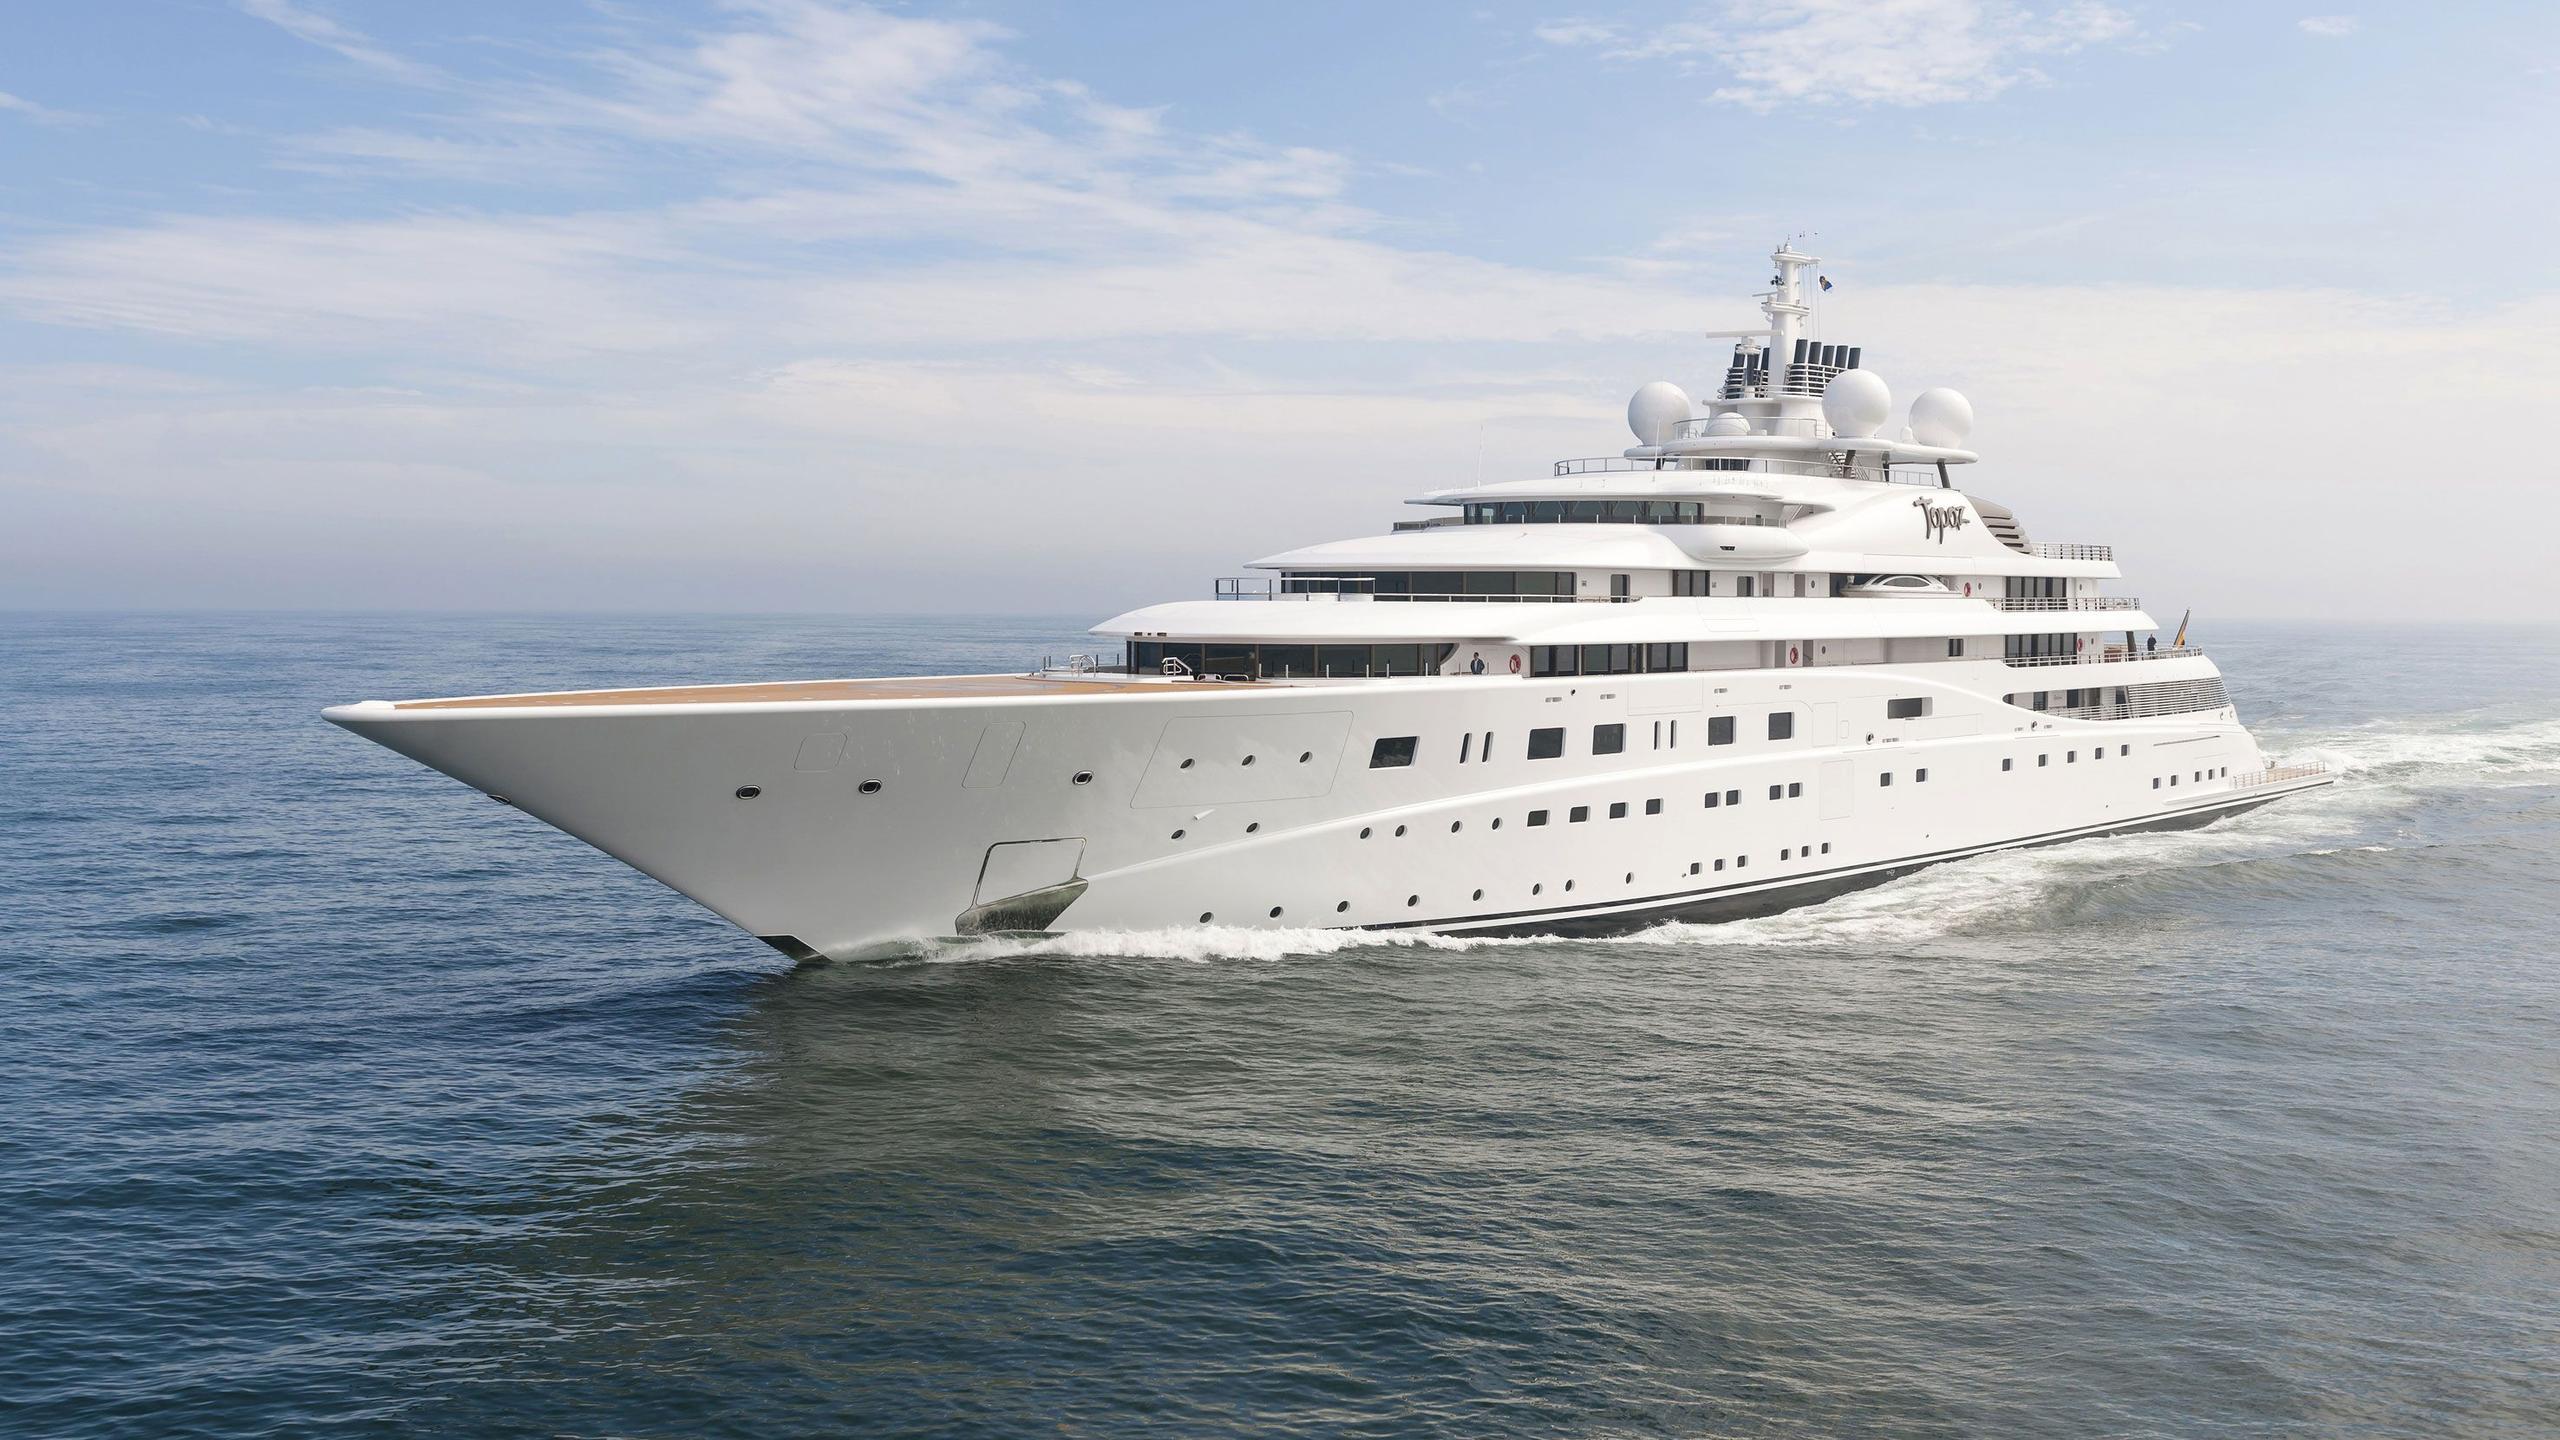 Topaz yacht running